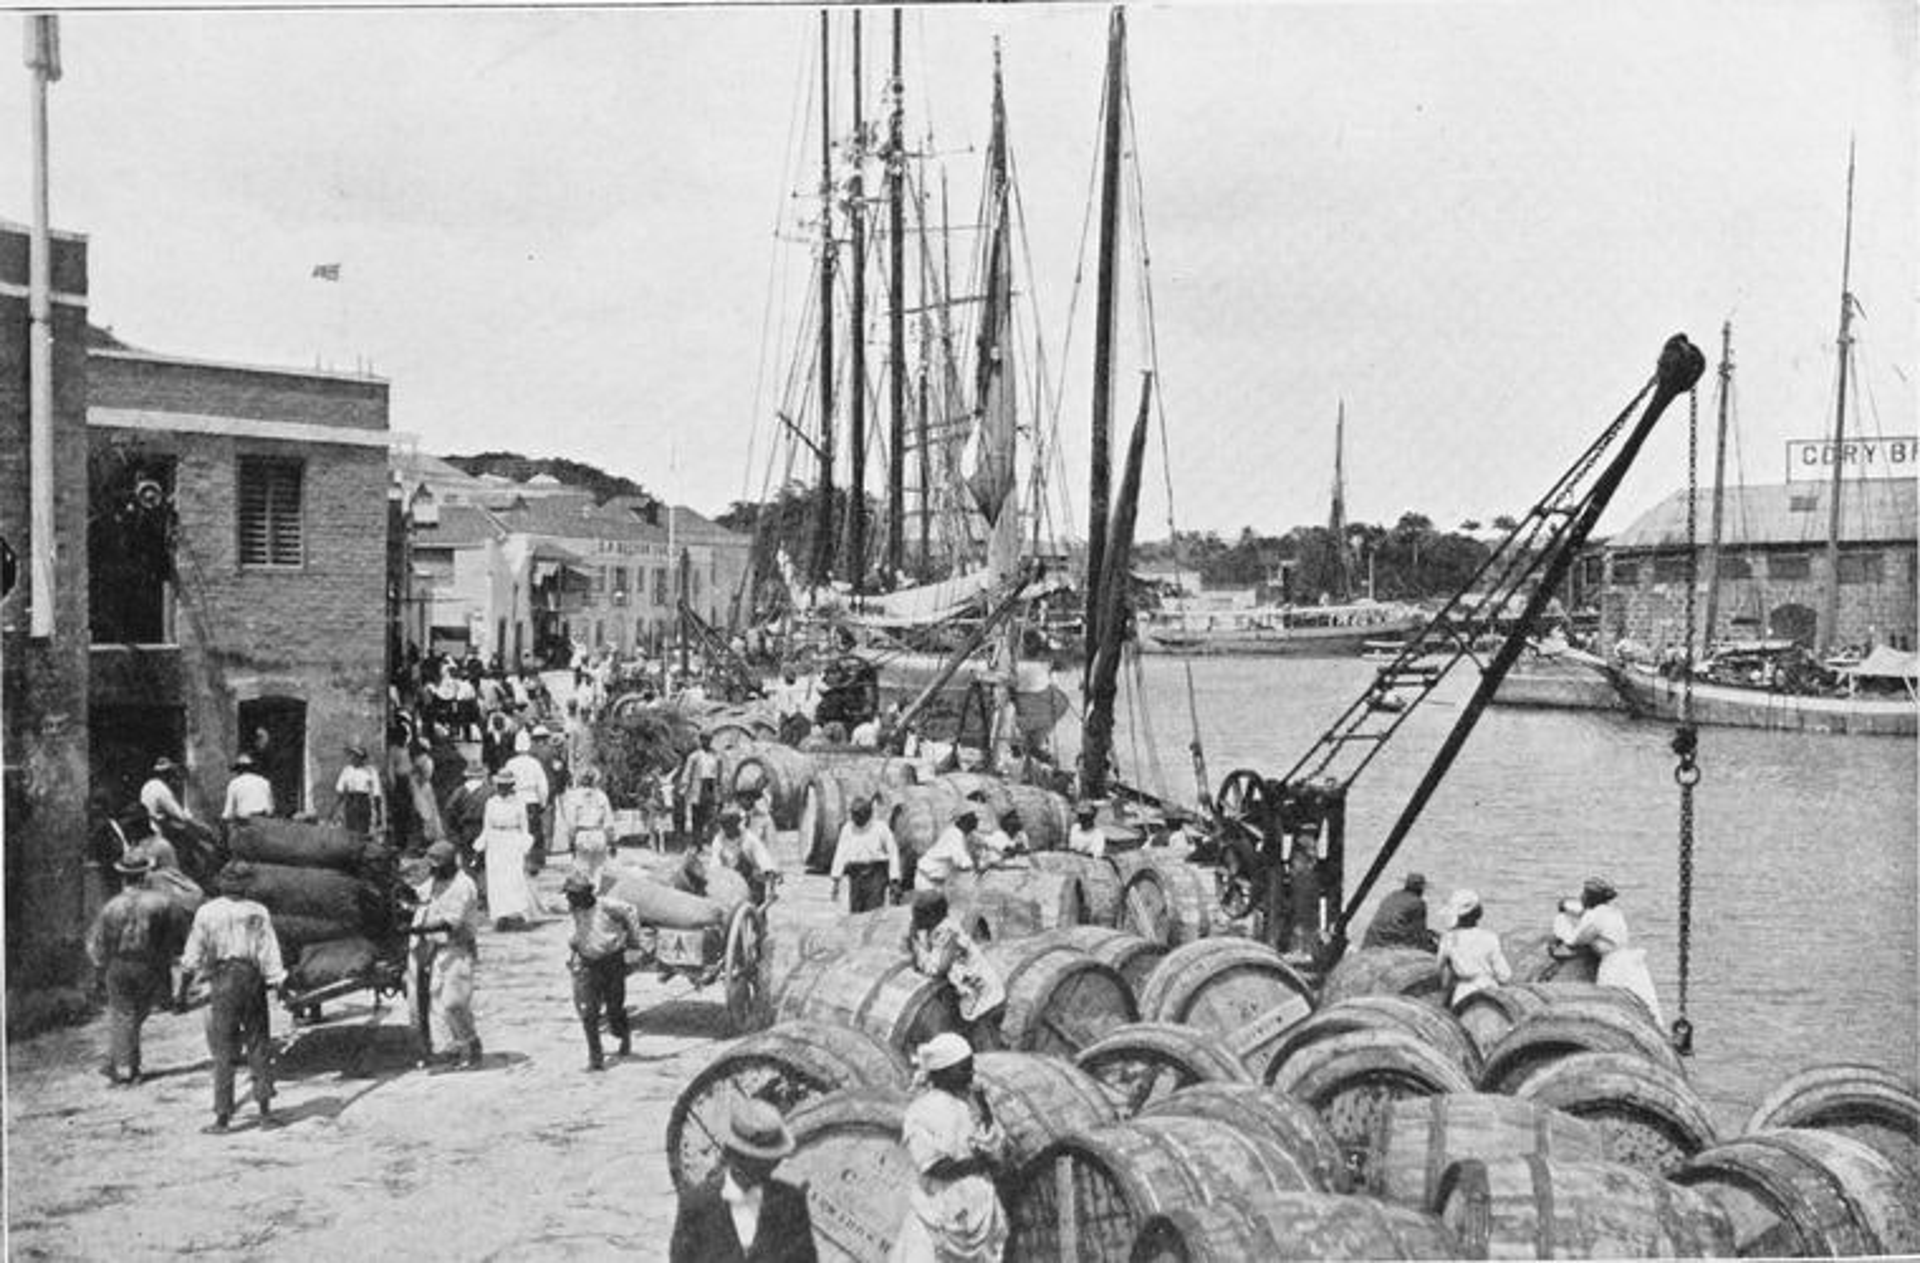 Shipping sugar, Bridgetown, Barbados, 1909.